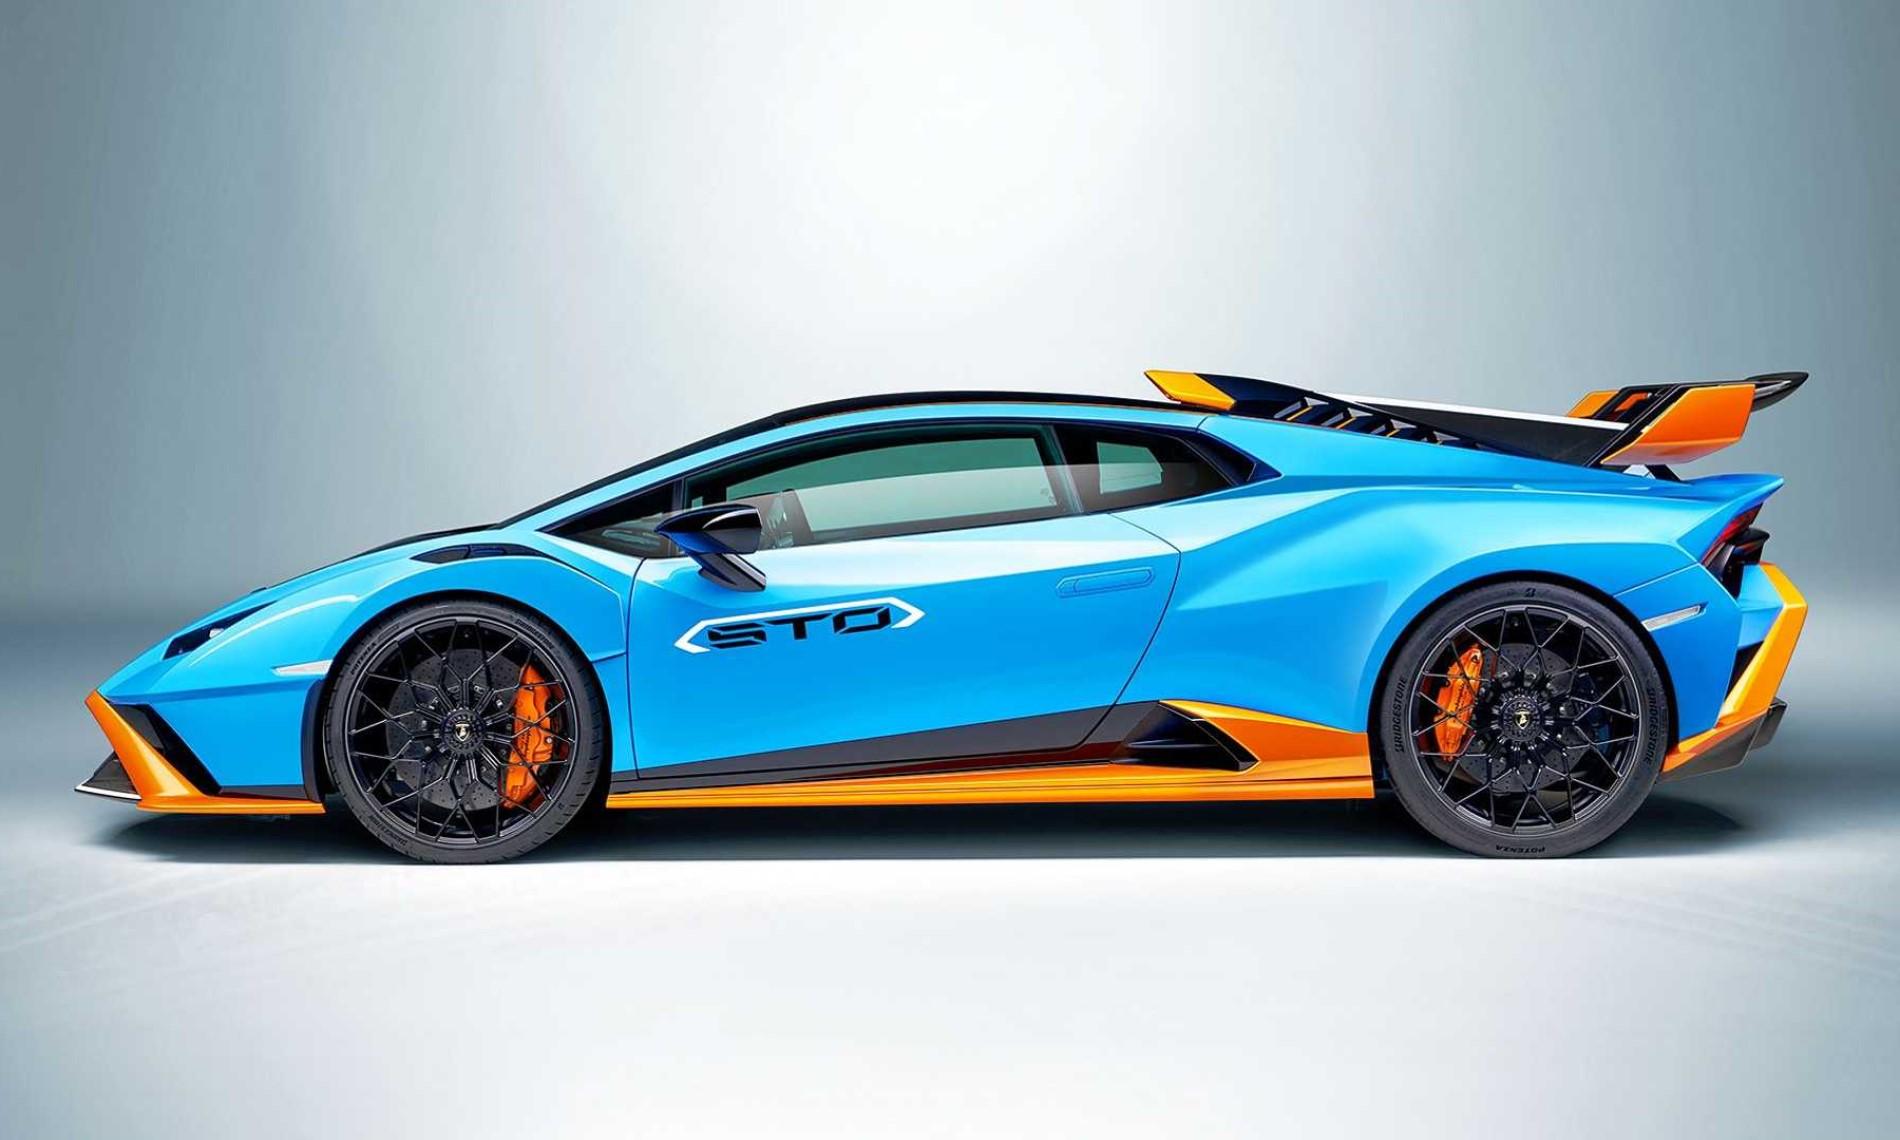 Lamborghini Huracan STO profile